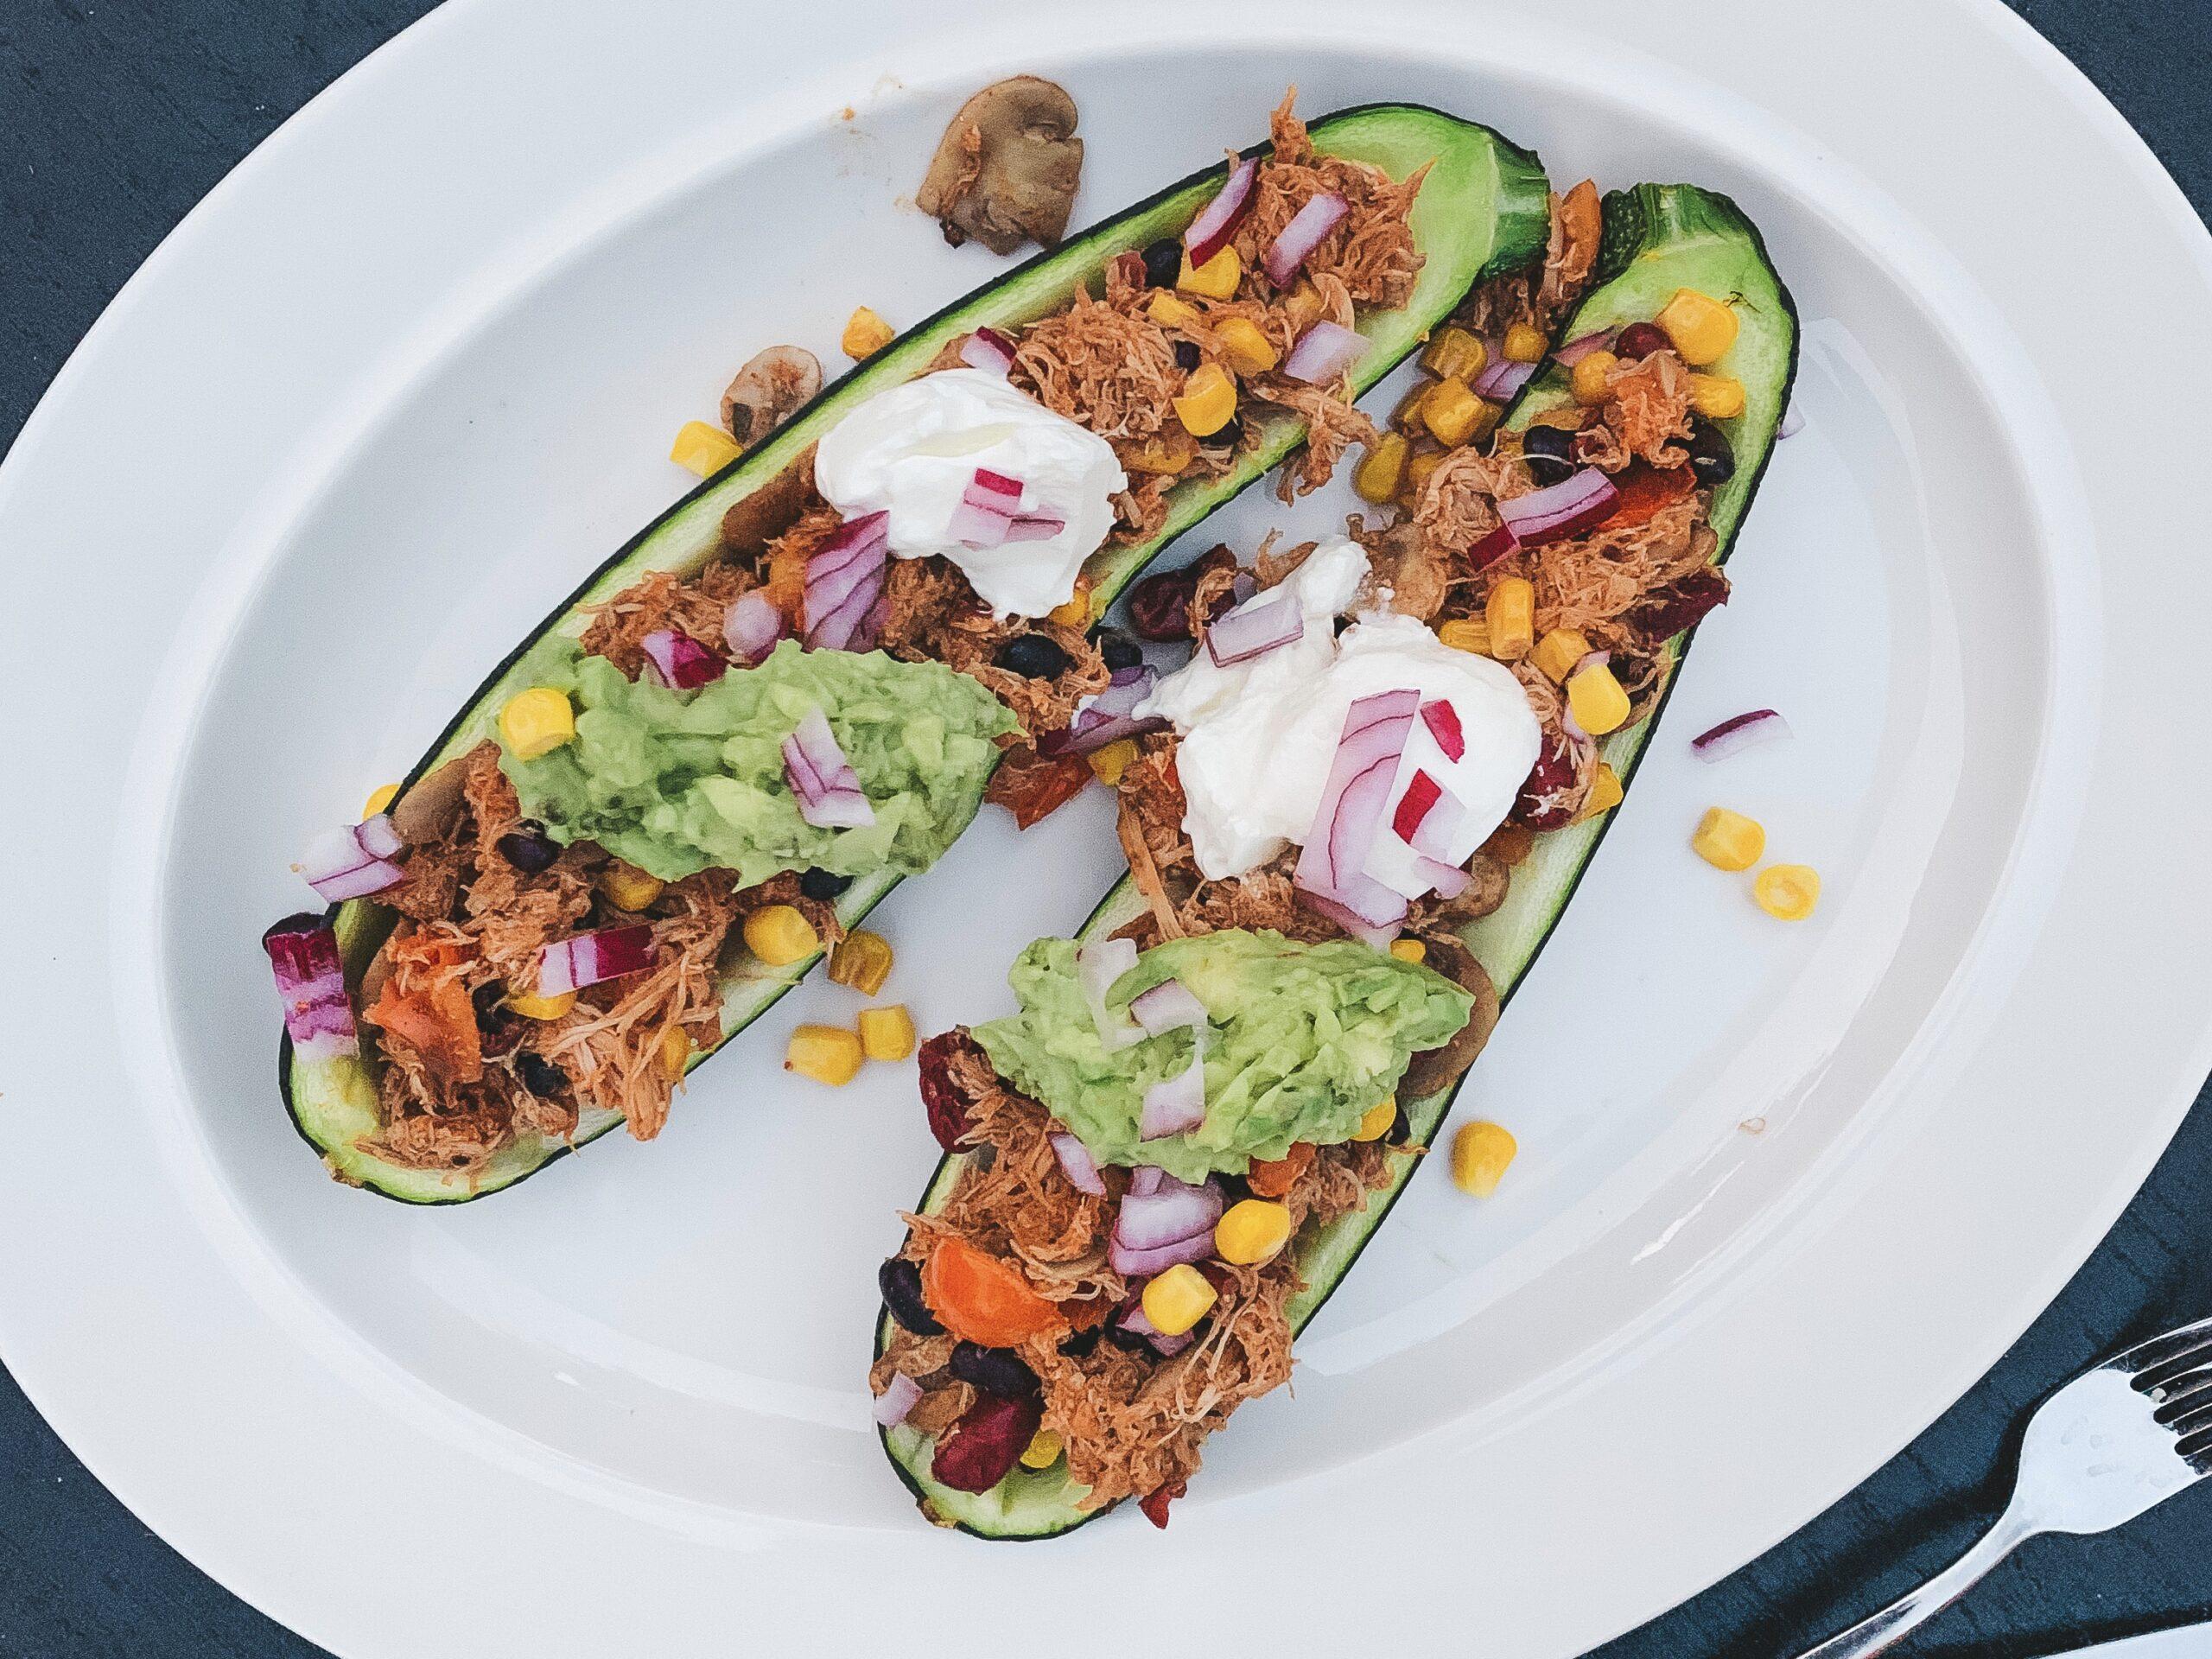 Mexicaans gevulde courgette met pulled chicken